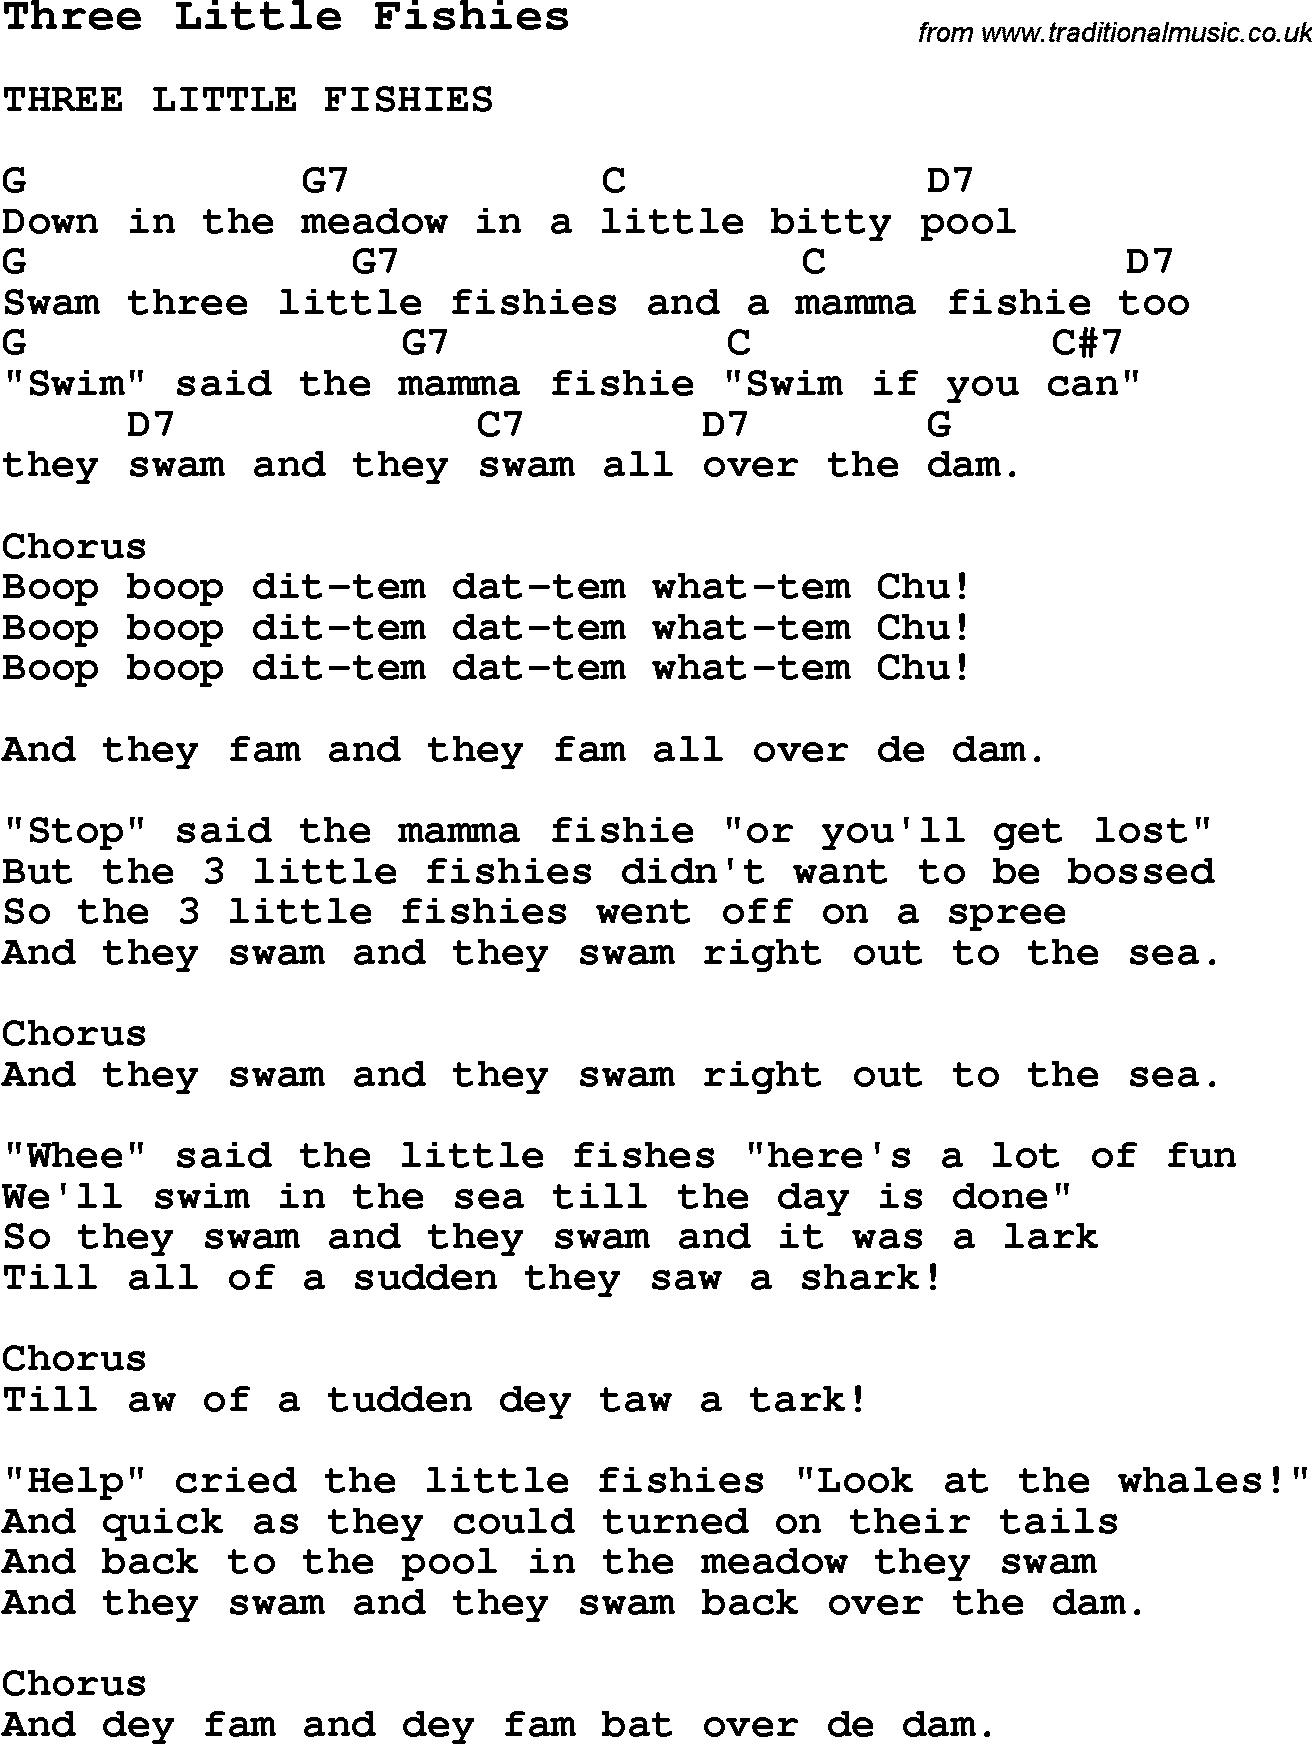 pdf song lyrics and chords